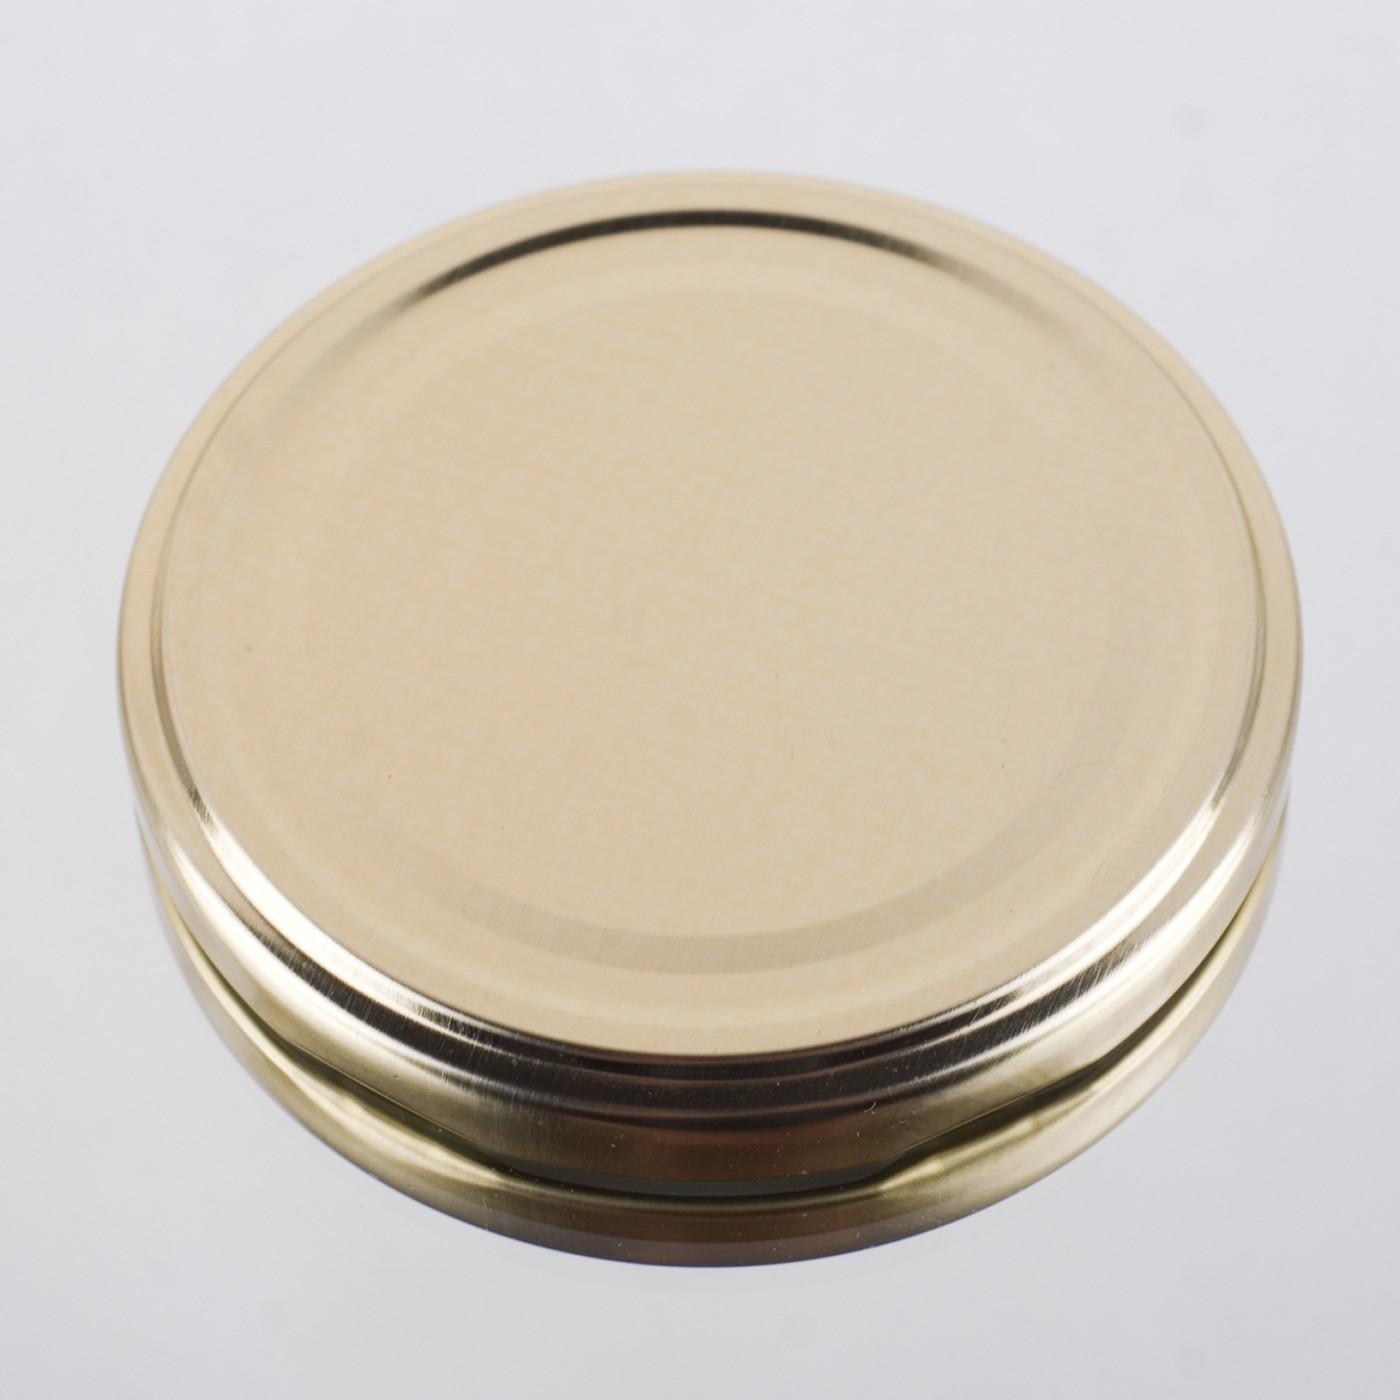 Zakrętka Ø 82/6 Złota - pakowane po 630/750 sztuk (cena za sztukę)